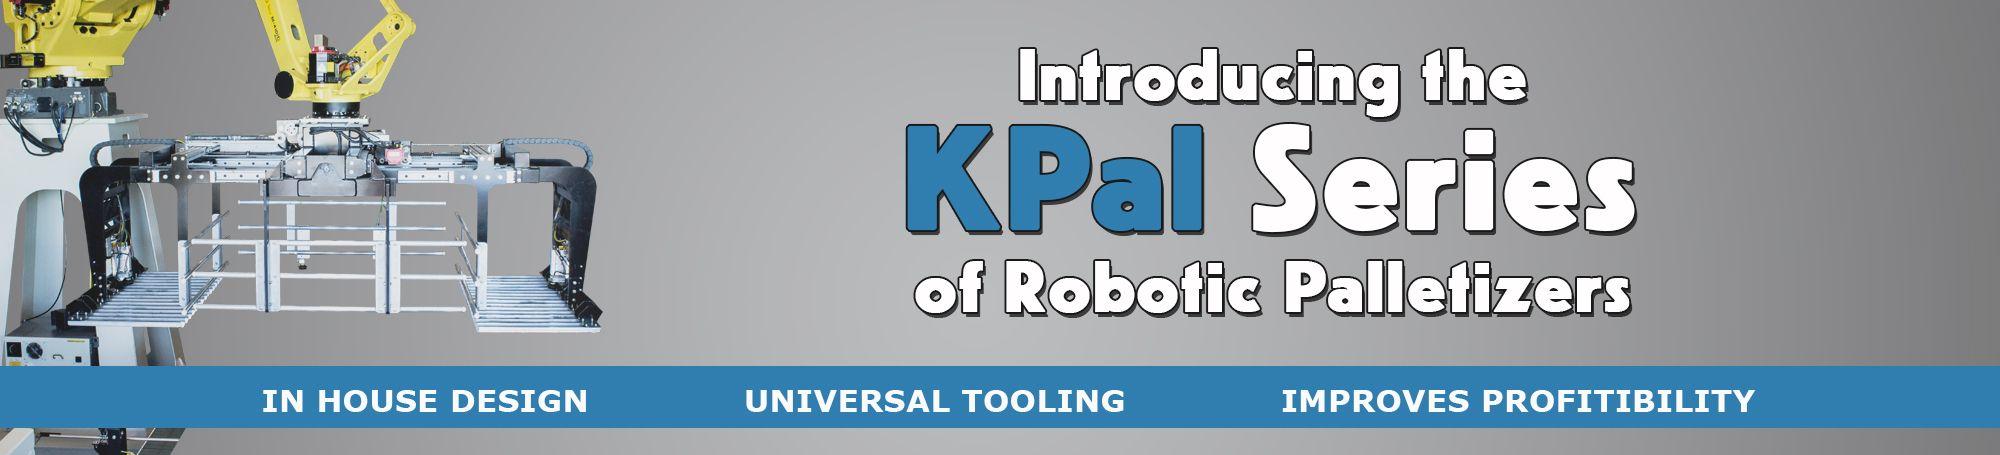 KPal Header.jpg